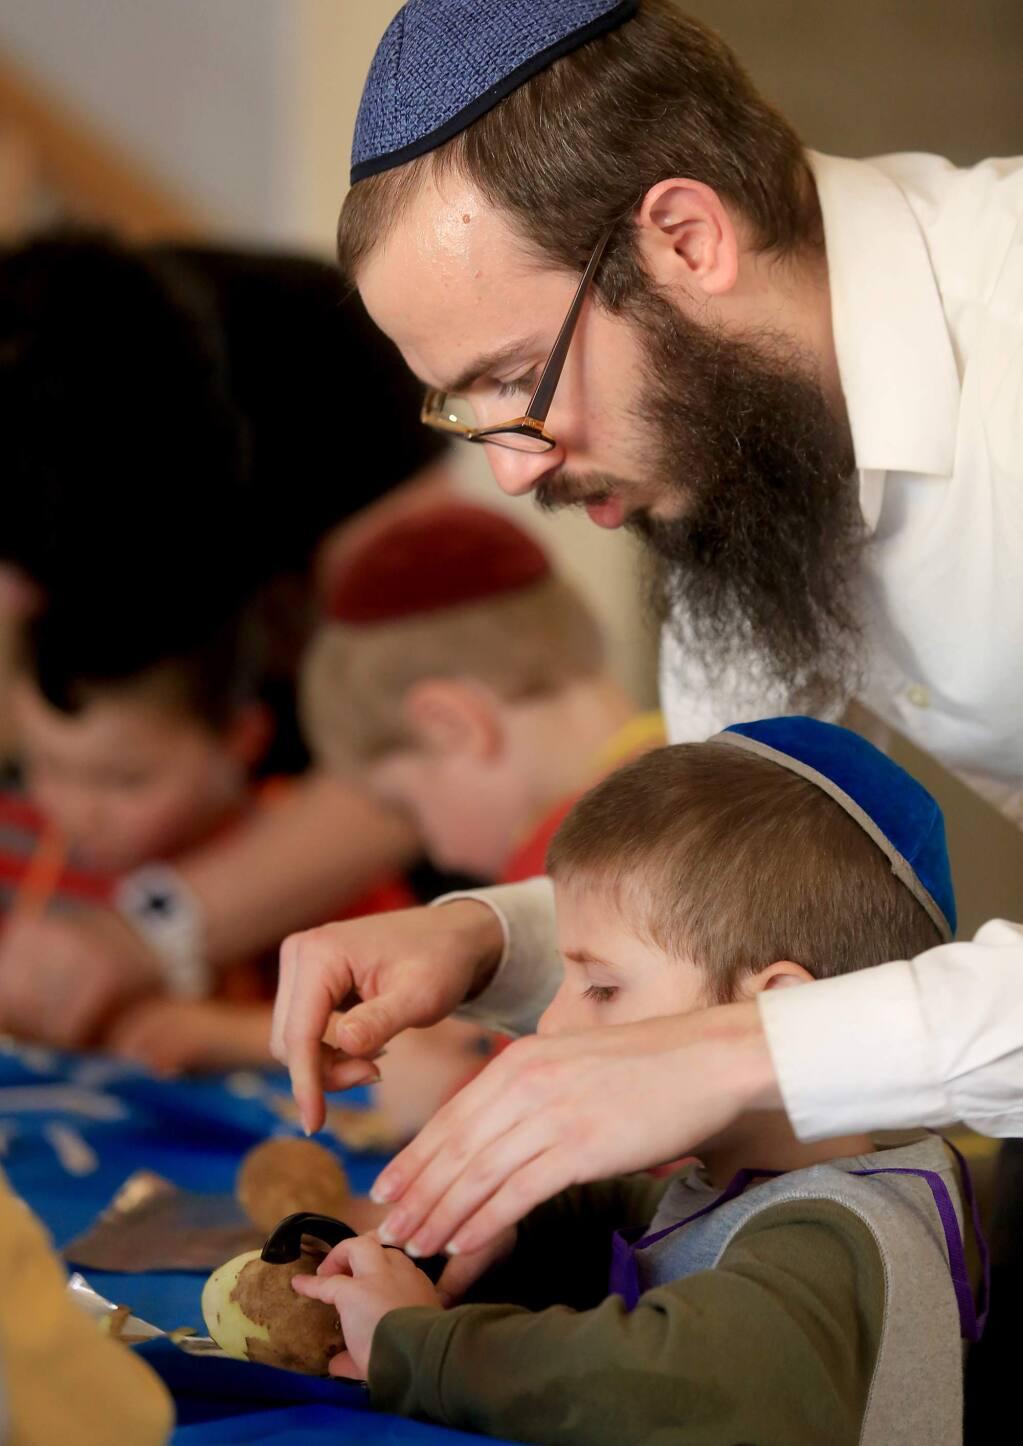 Rabbi Dovid Bush helps his son Shlomie make Boureka, thin Jewish pastries, at their home in Petaluma, as part of the Kids in the Kitchen program run by Dovid's wife, Devorah Bush.Kent Porter Press Democrat